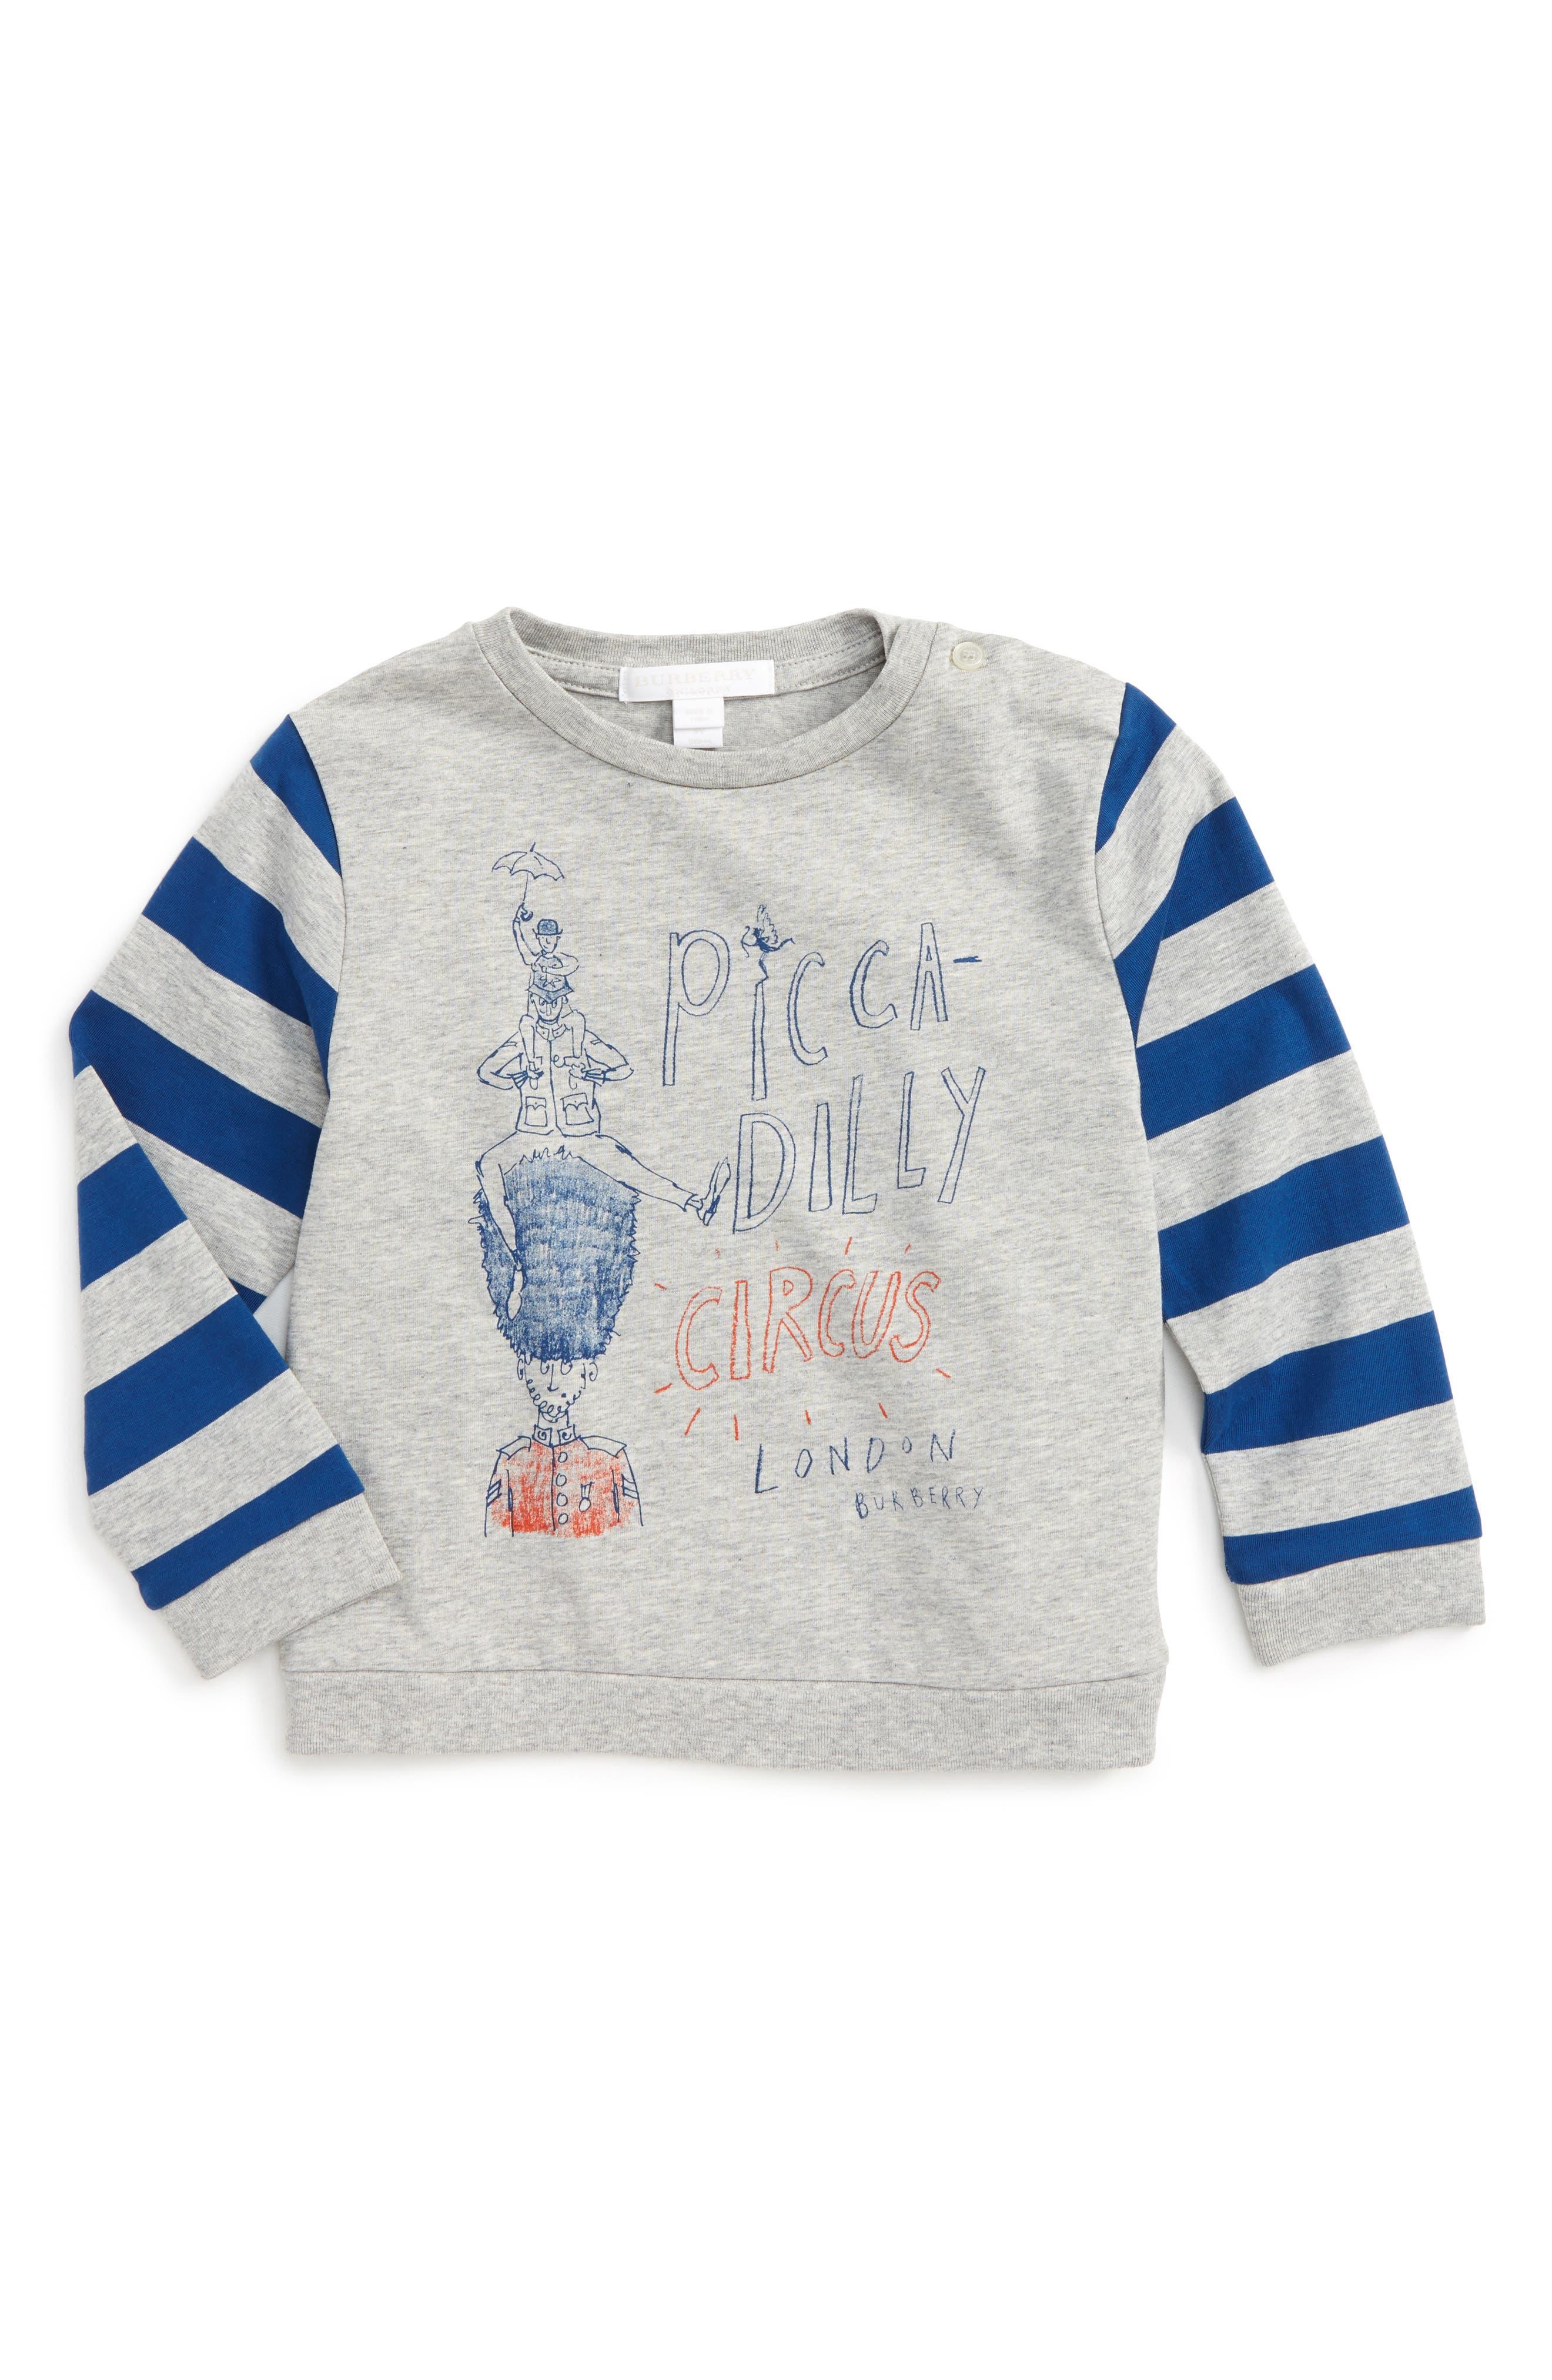 Oliver Graphic Sweatshirt,                         Main,                         color, Navy/ Grey